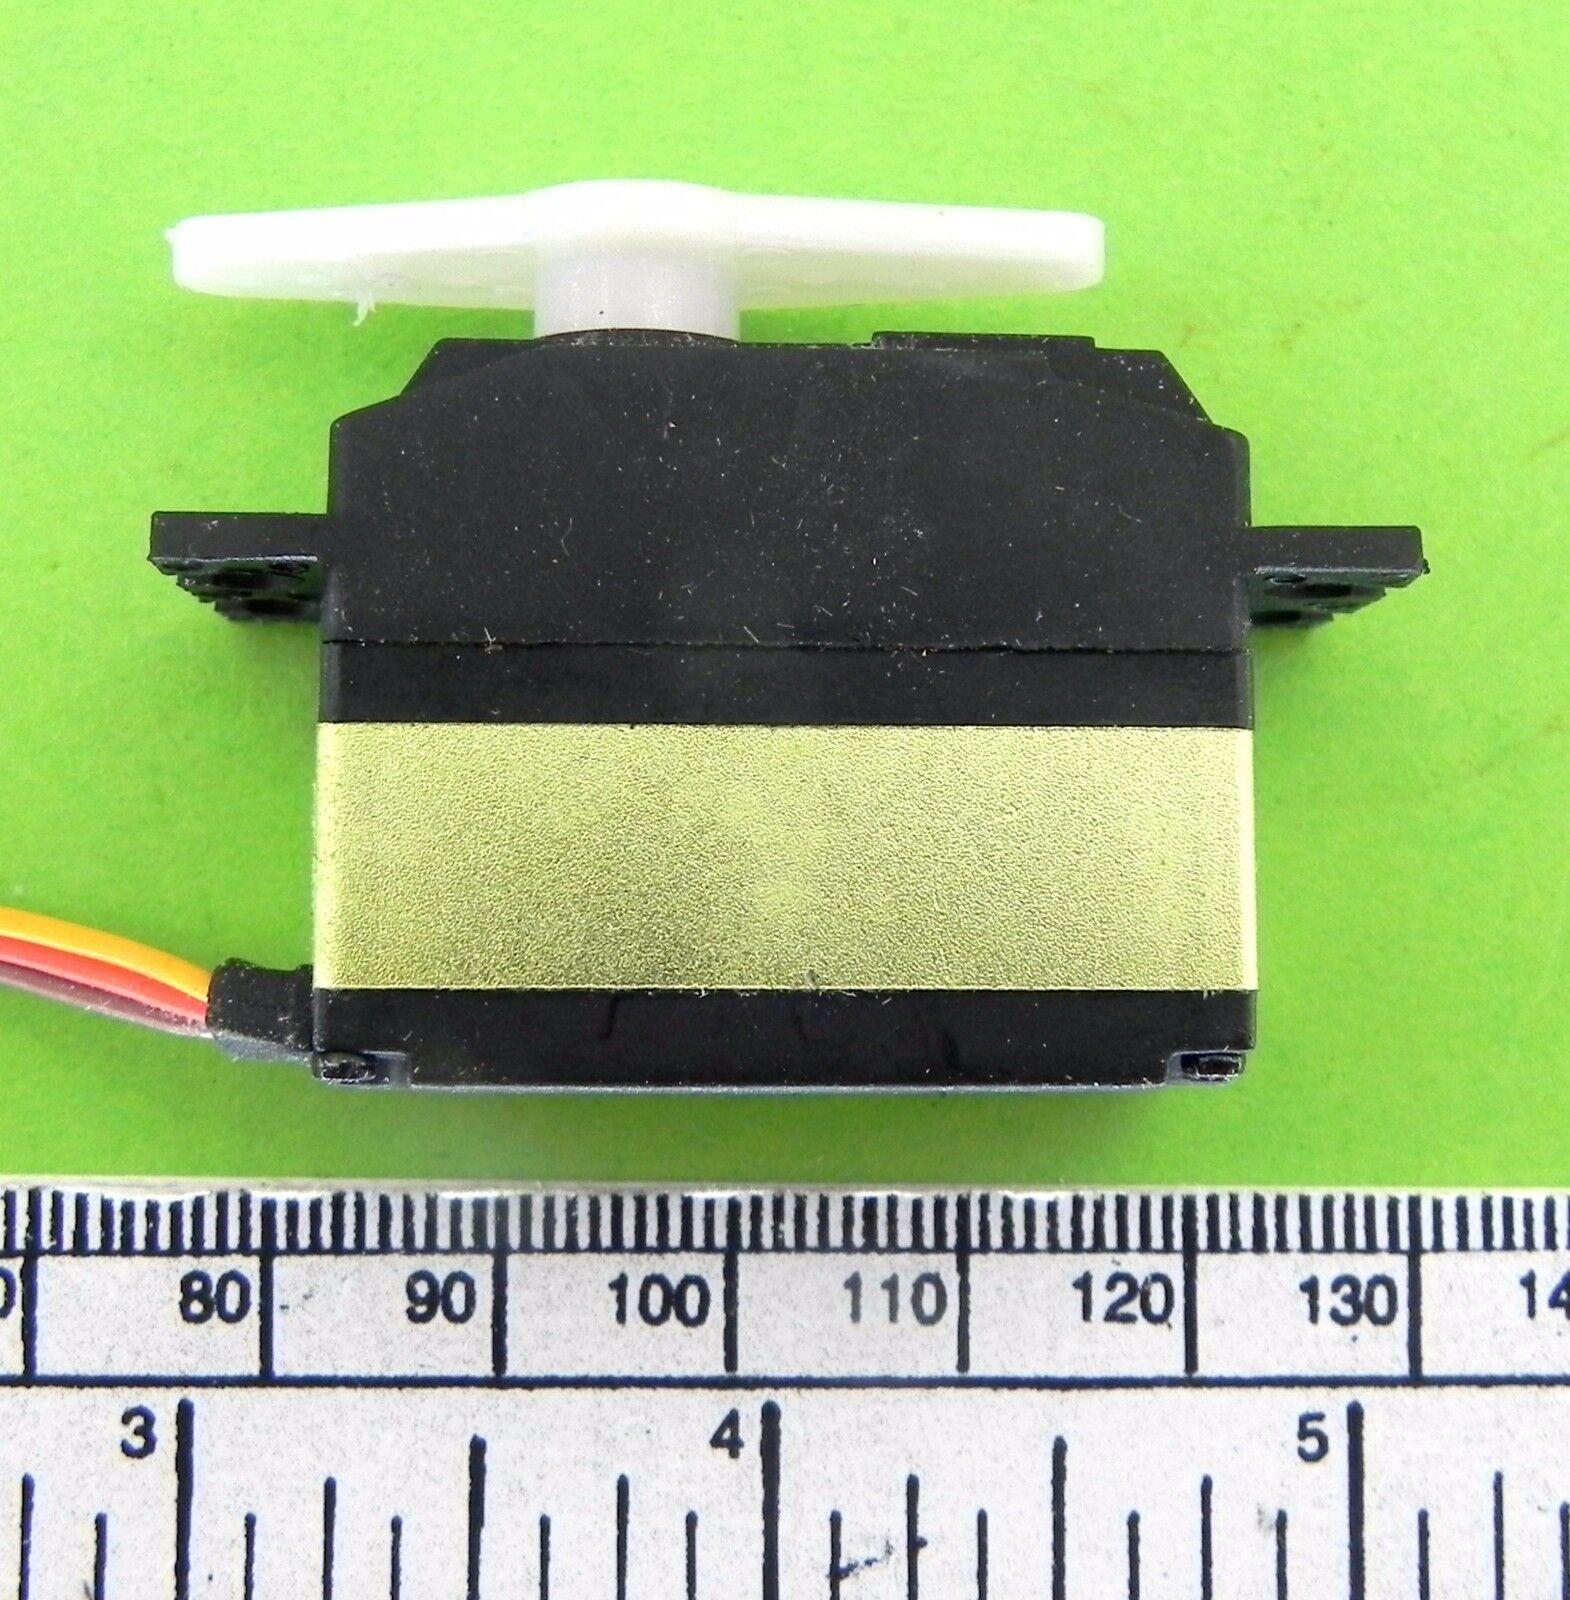 WL Toys V383 Assassin quad-copter part 53 (part) (part) (part) - servo c93c29